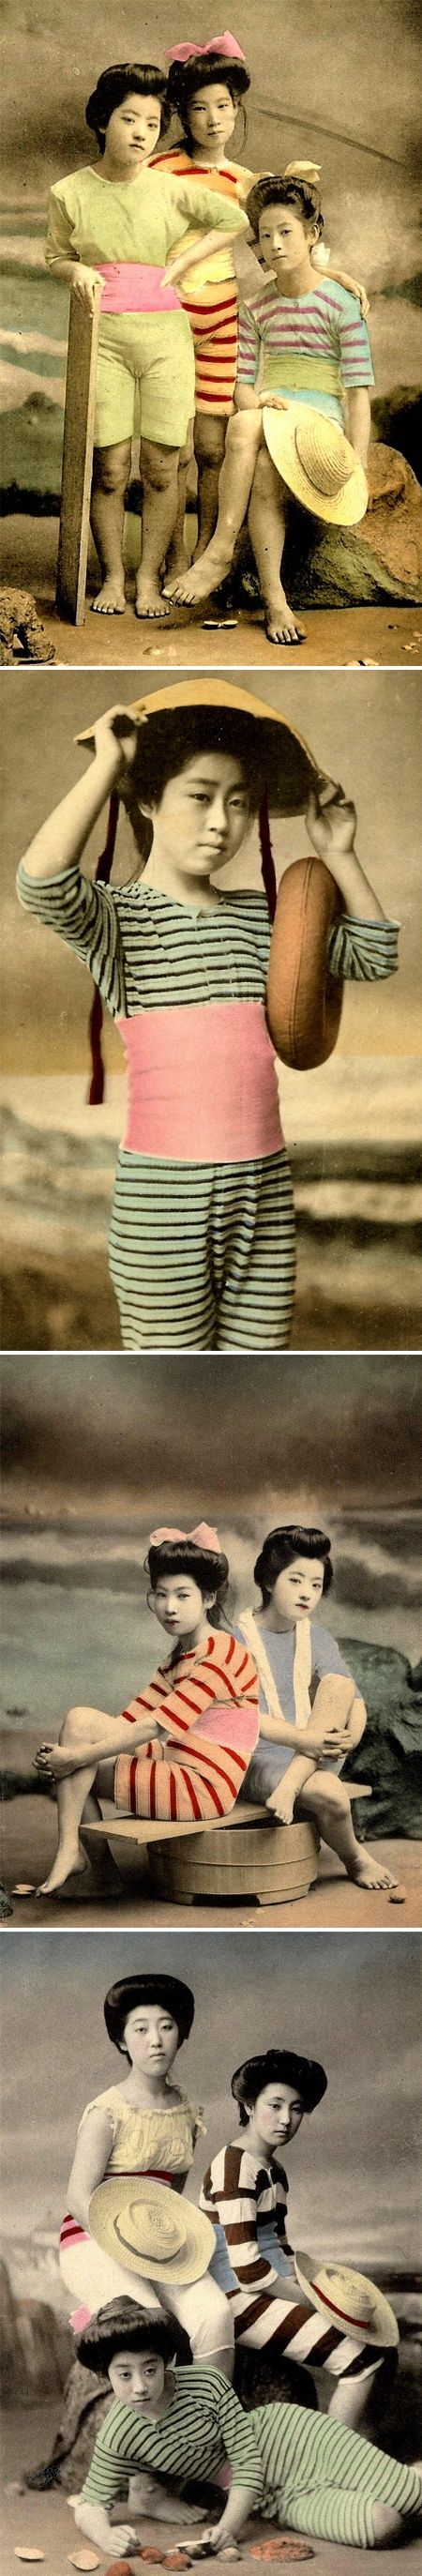 Studio portraits of Japanese women of wealth dressed in bathing costumes, Taisho era, c 1912- 26. S)